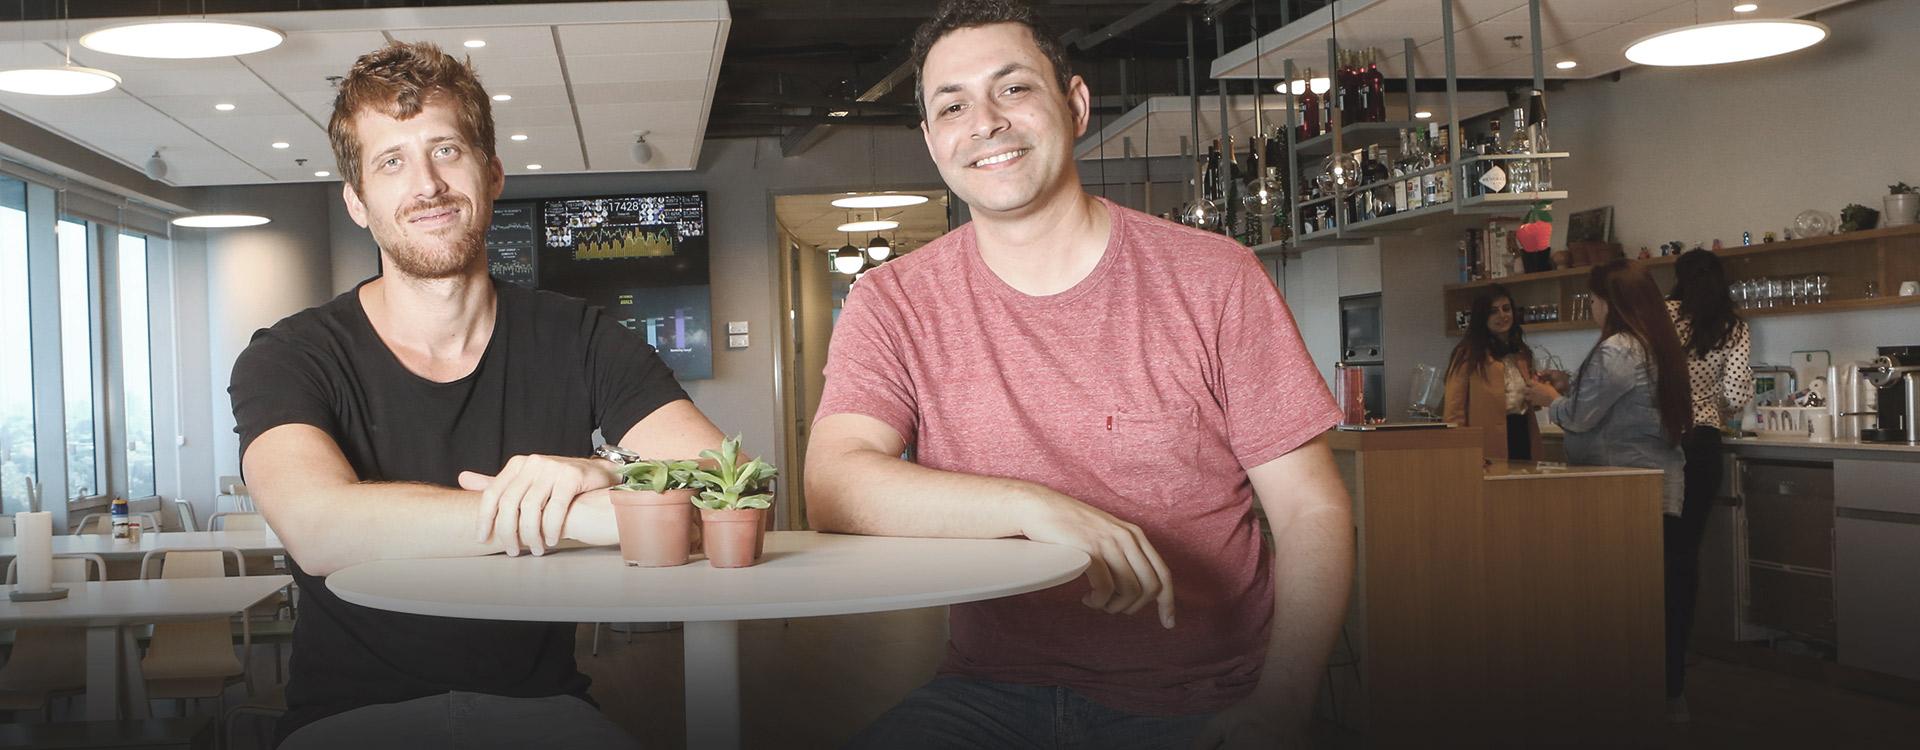 Promising Startups - סטארטאפים- monday / צילום: שלומי יוסף